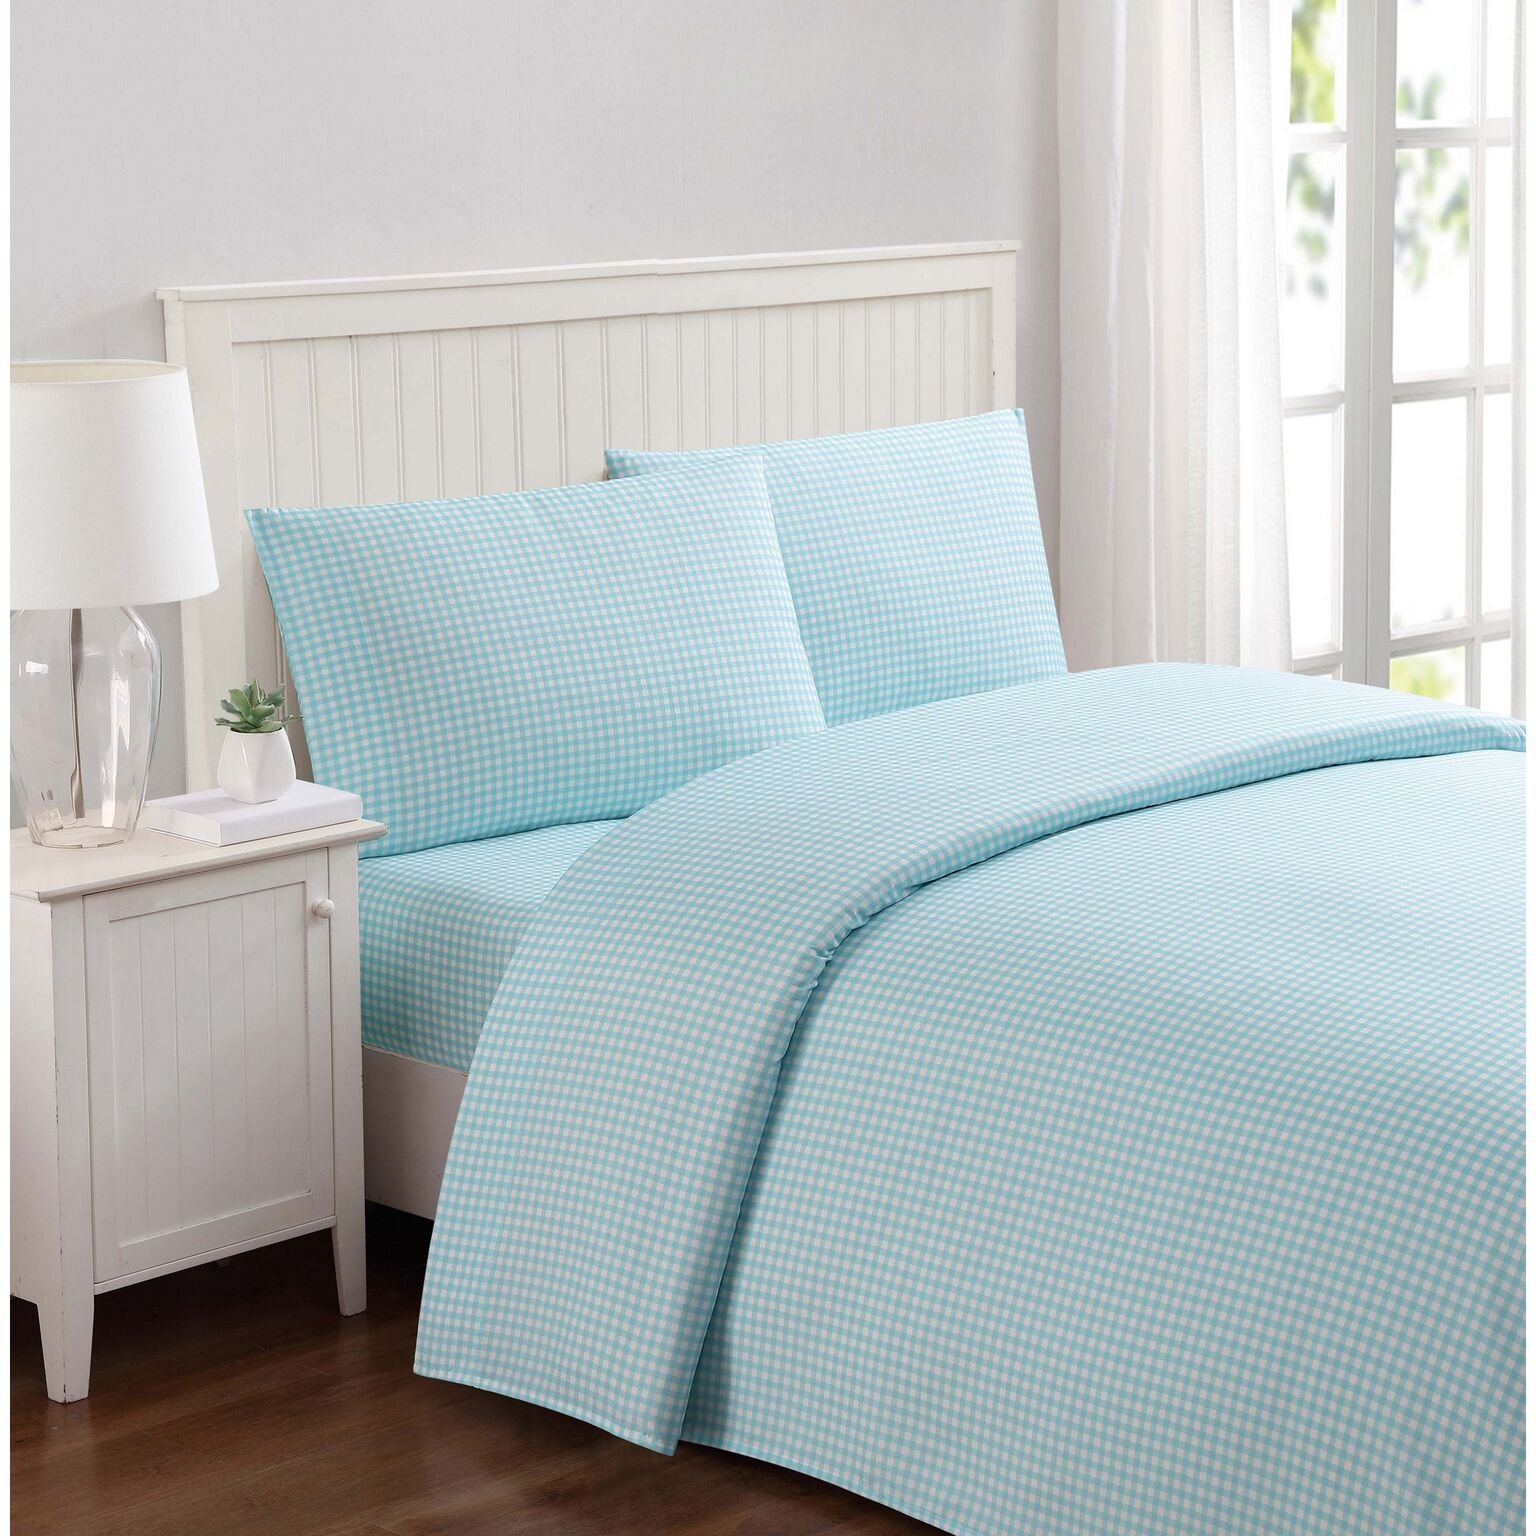 Truly Soft Everyday Printed Gingham Sheet Set, Full, Aqua